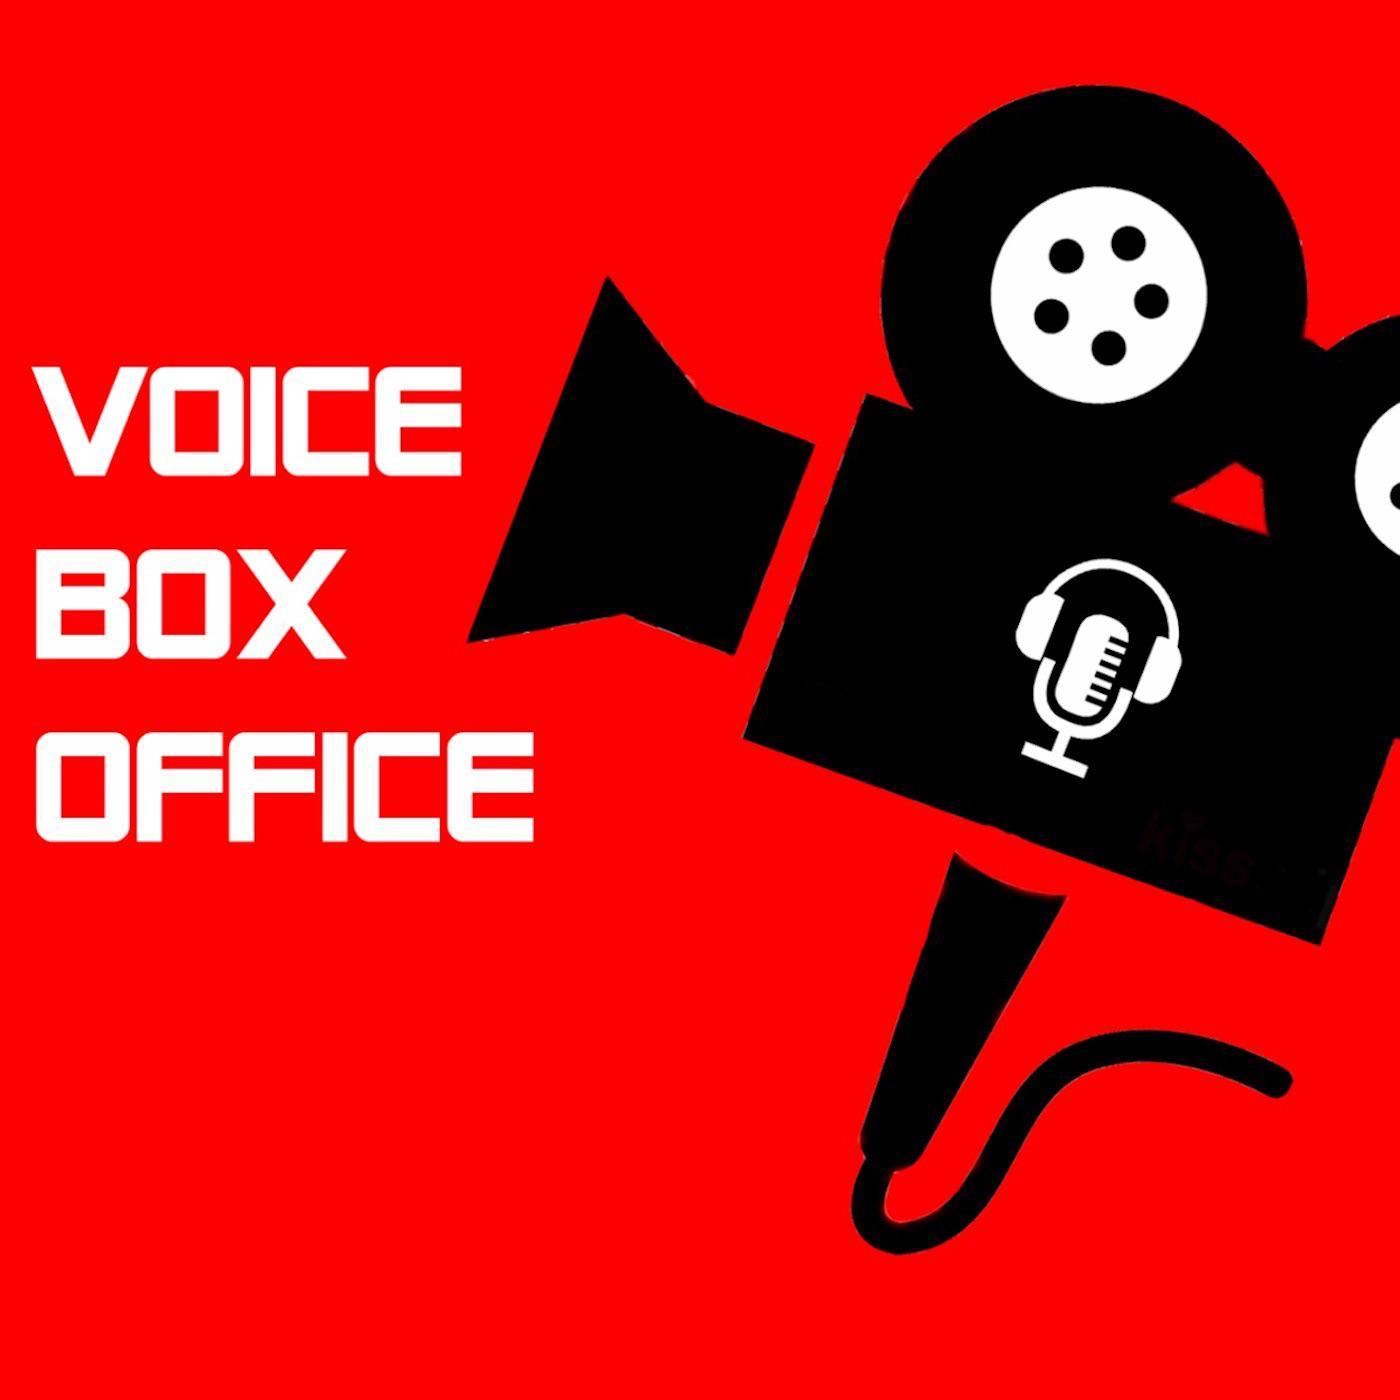 Voiceboxoffice Movie Reviews Chatter Podcast Luke Parker Listen Notes